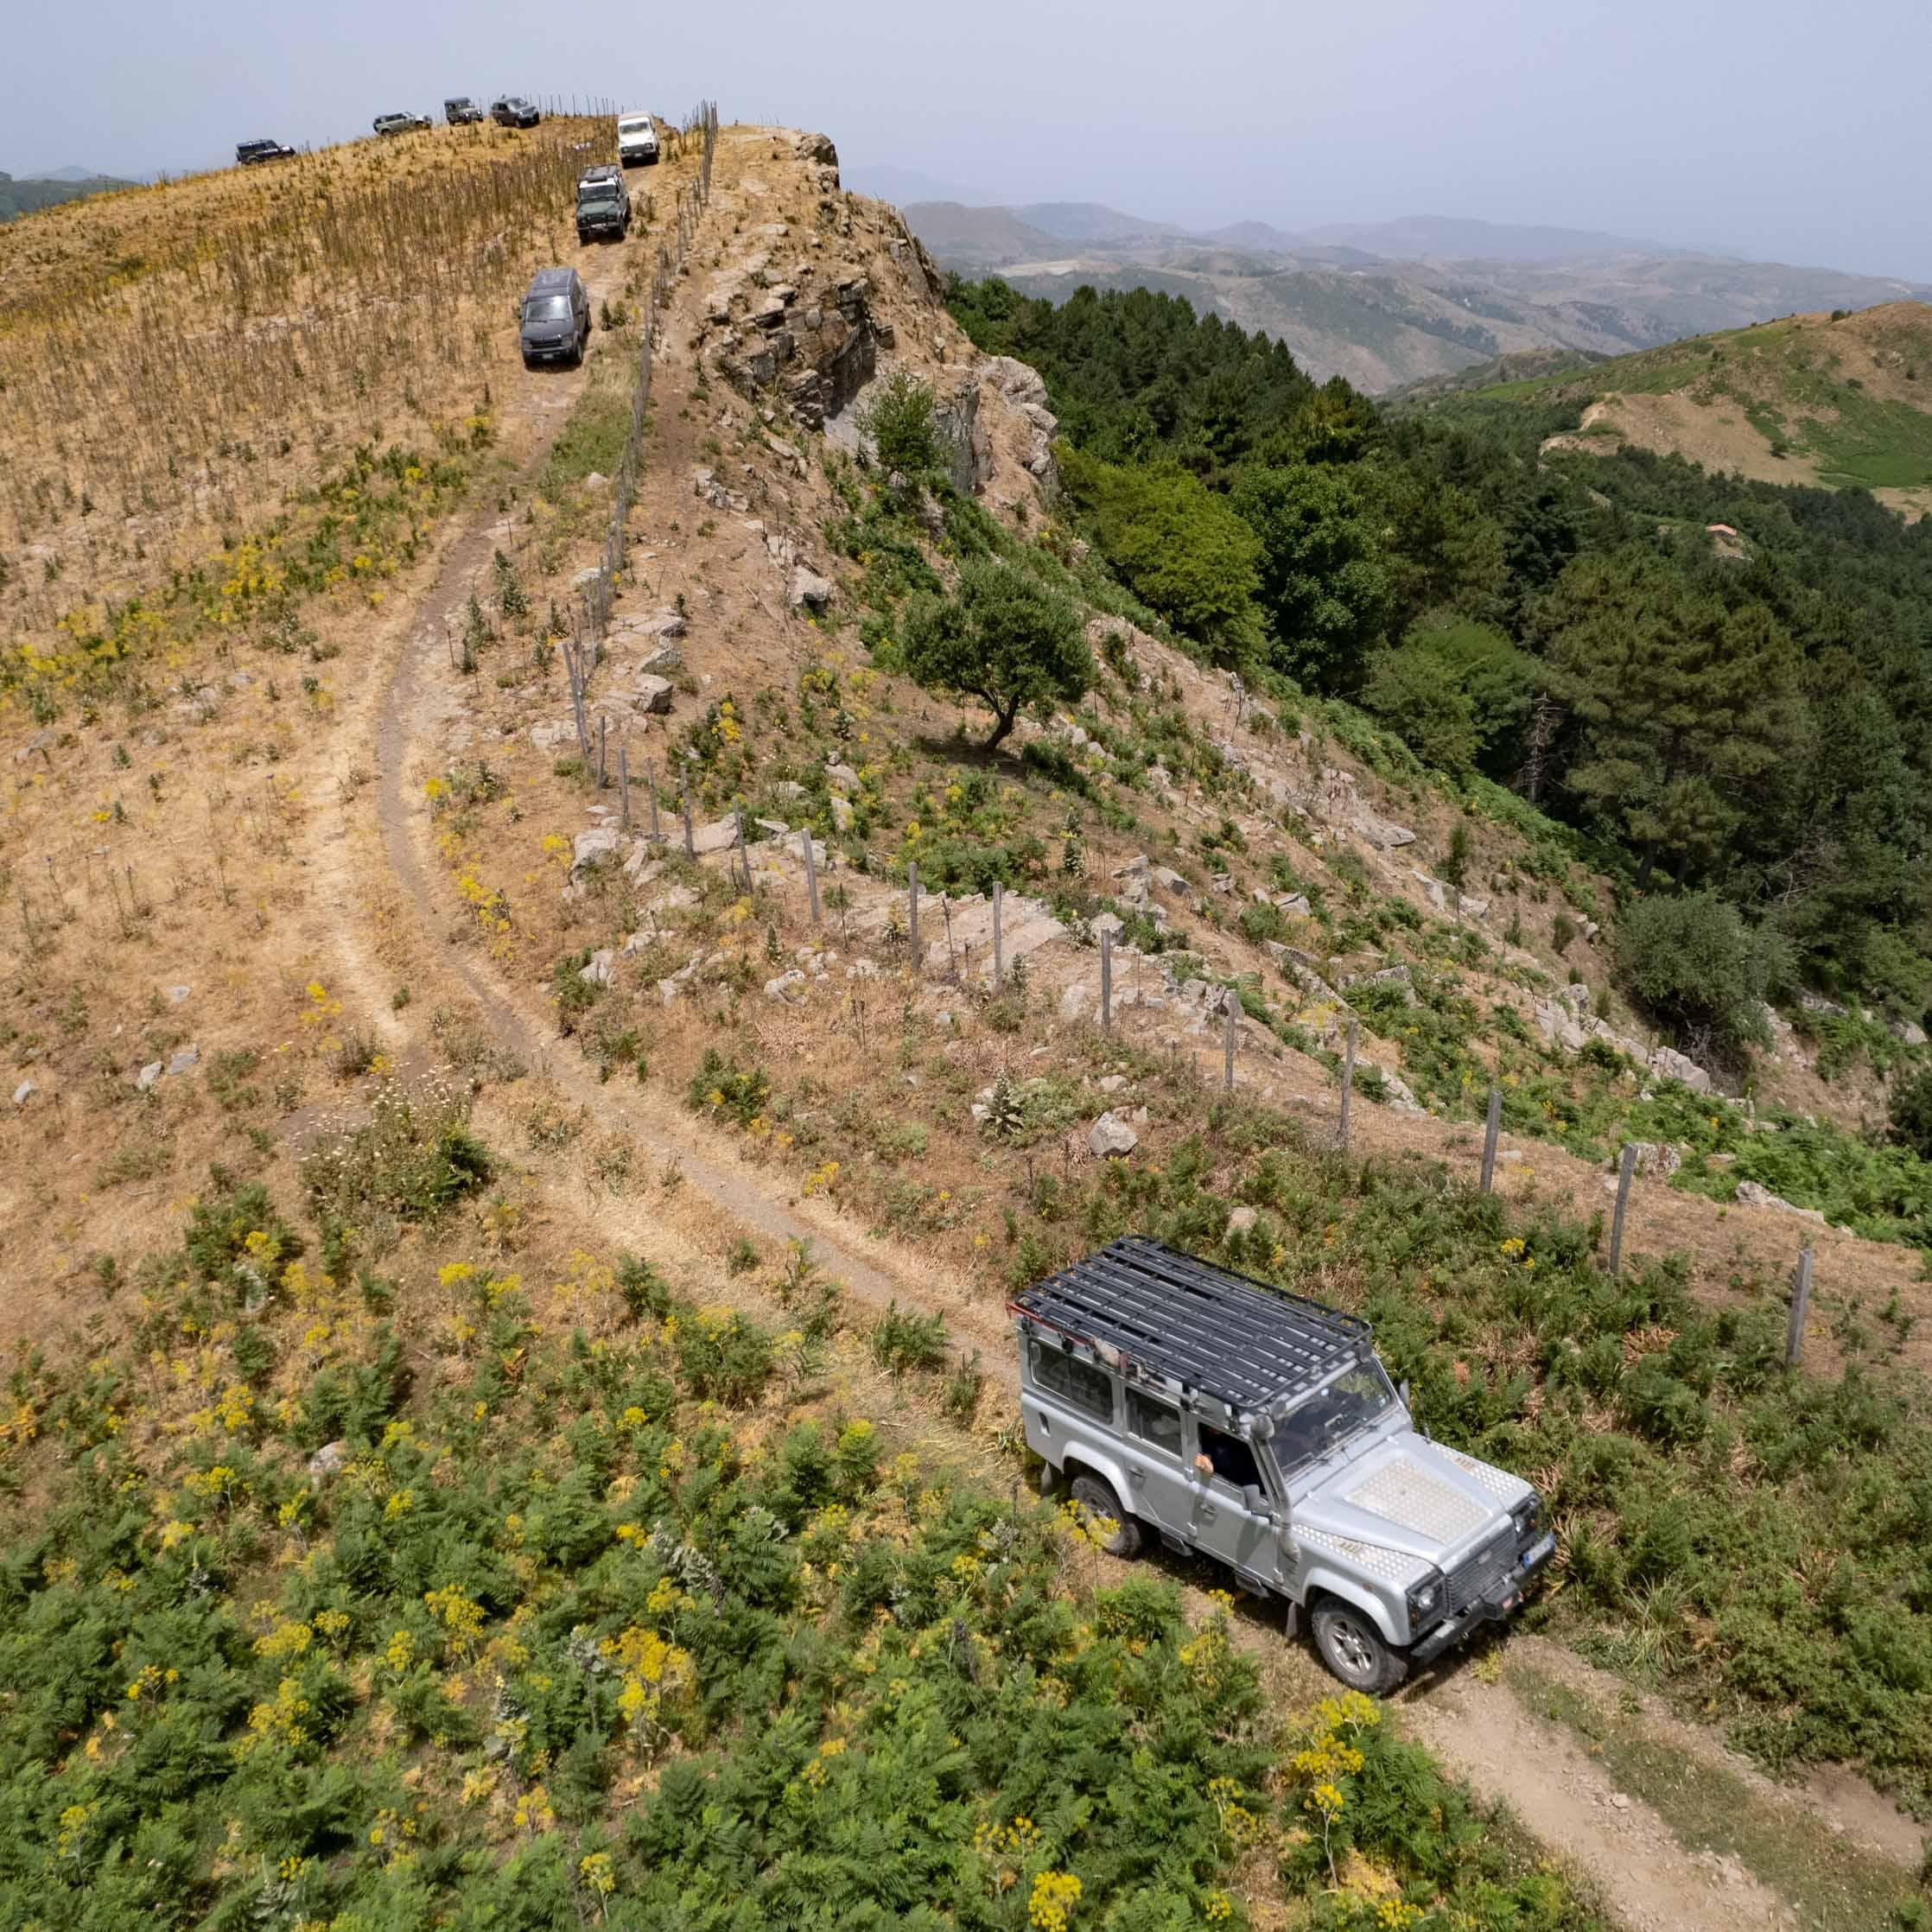 Land_Rover_Tour_Sicilia_2021_Land_Rover_Experience_Italia_-28